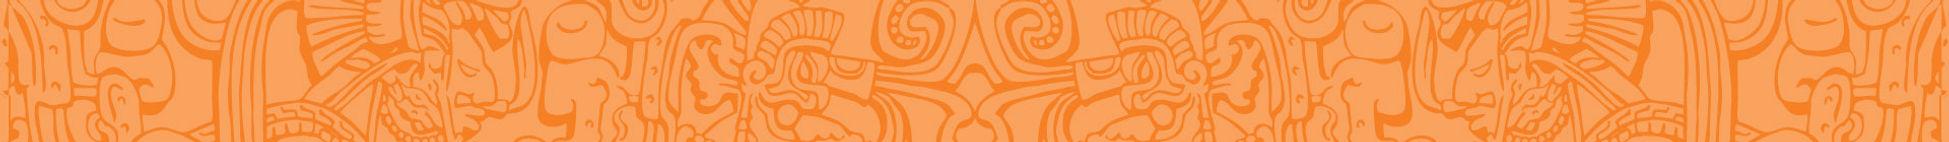 indigenous-pattern.jpg